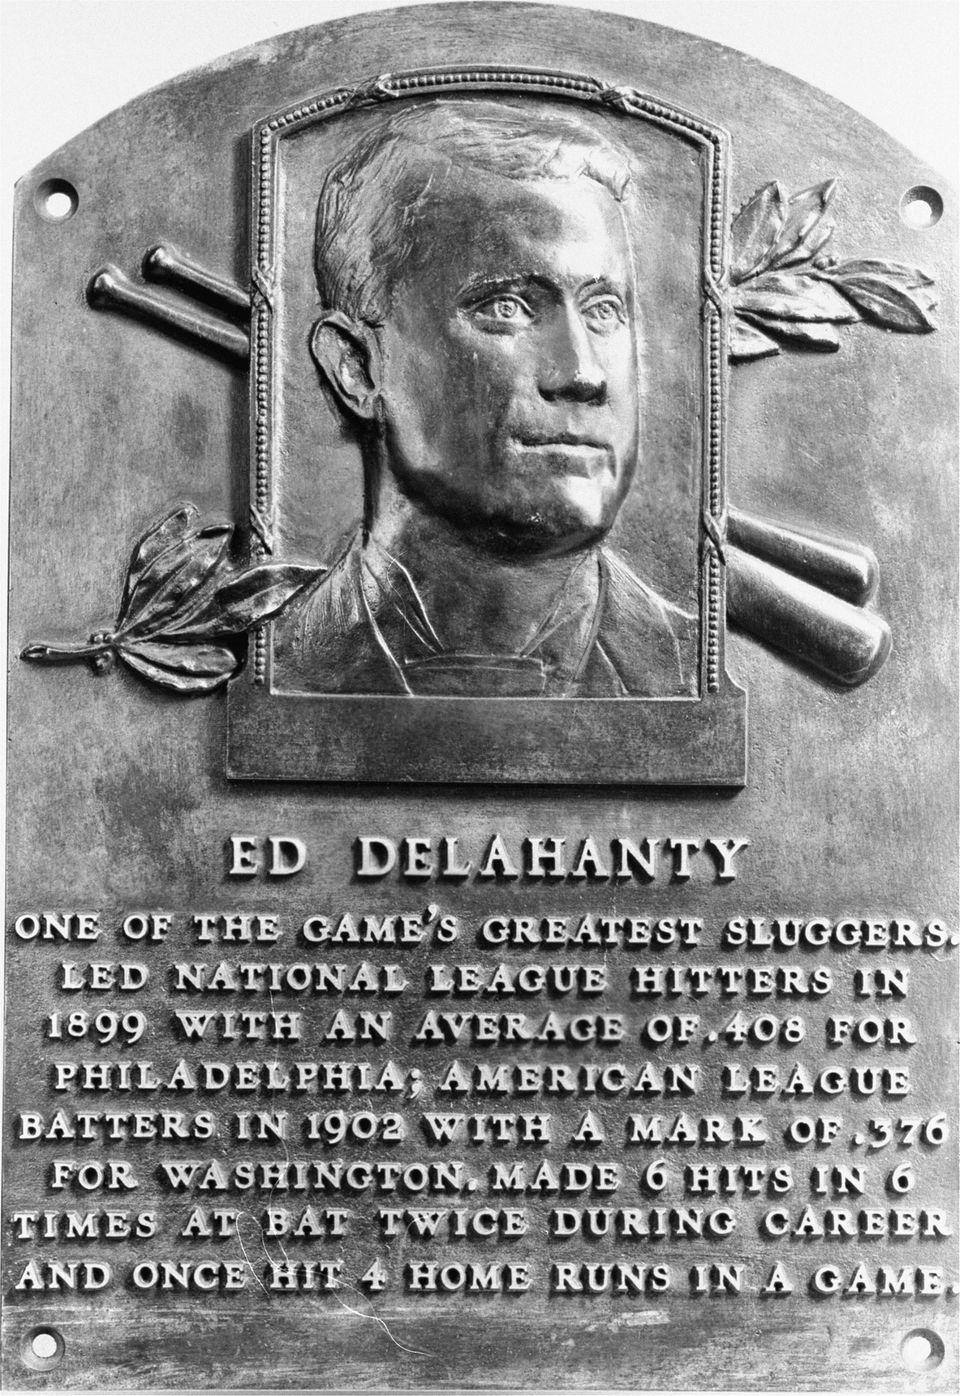 ED DELAHANTY, Philadelphia Quakers July 13, 1896 According